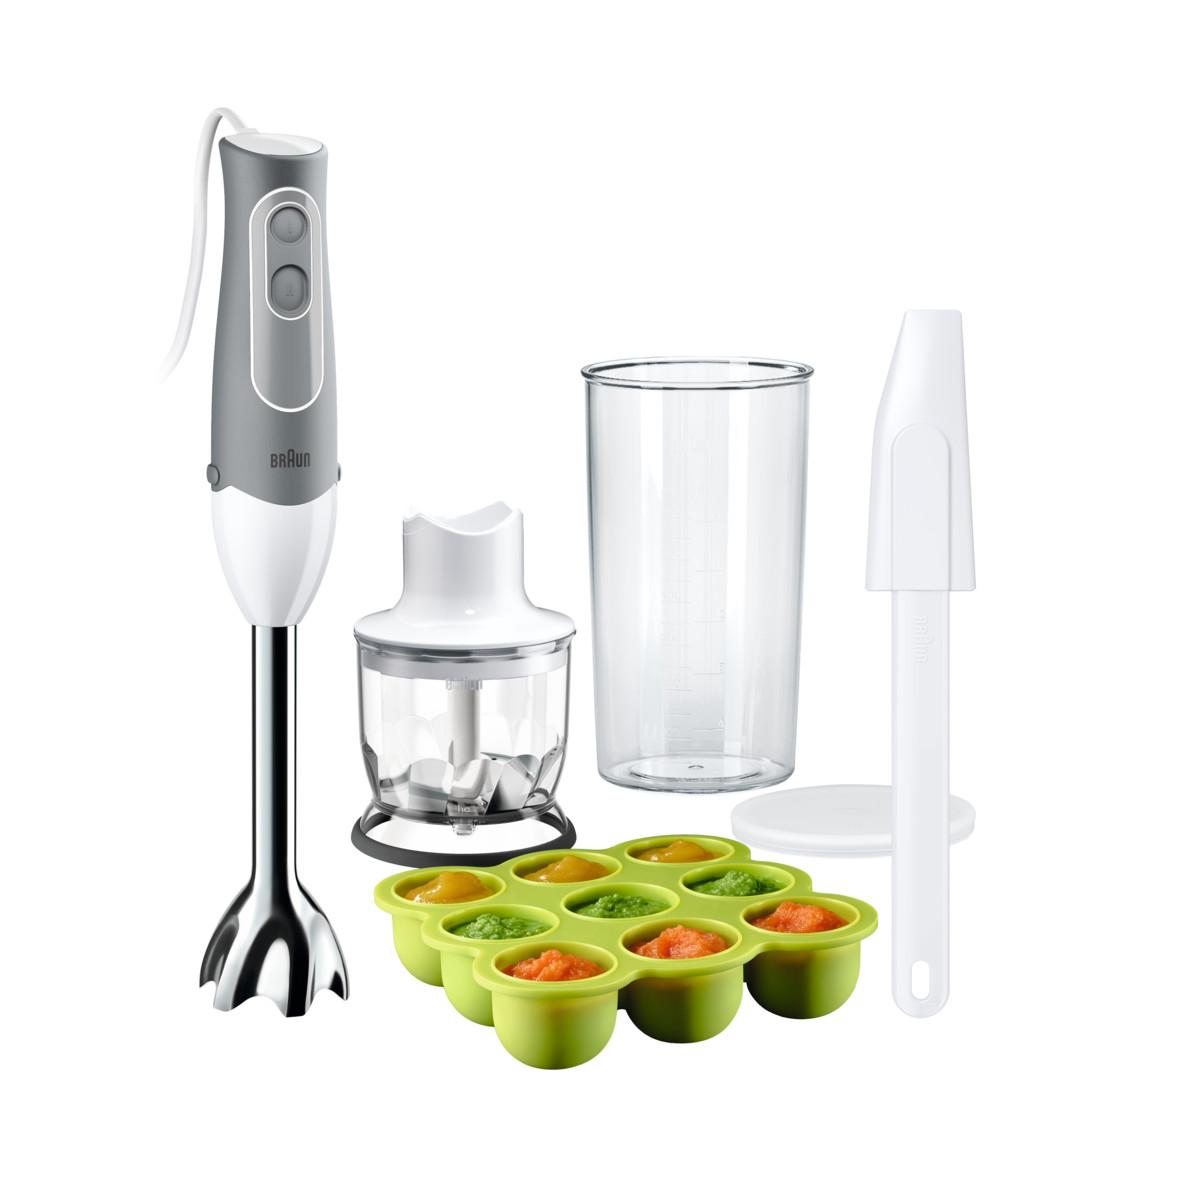 Braun MultiQuick 5 Baby Food Maker and Hand Blender